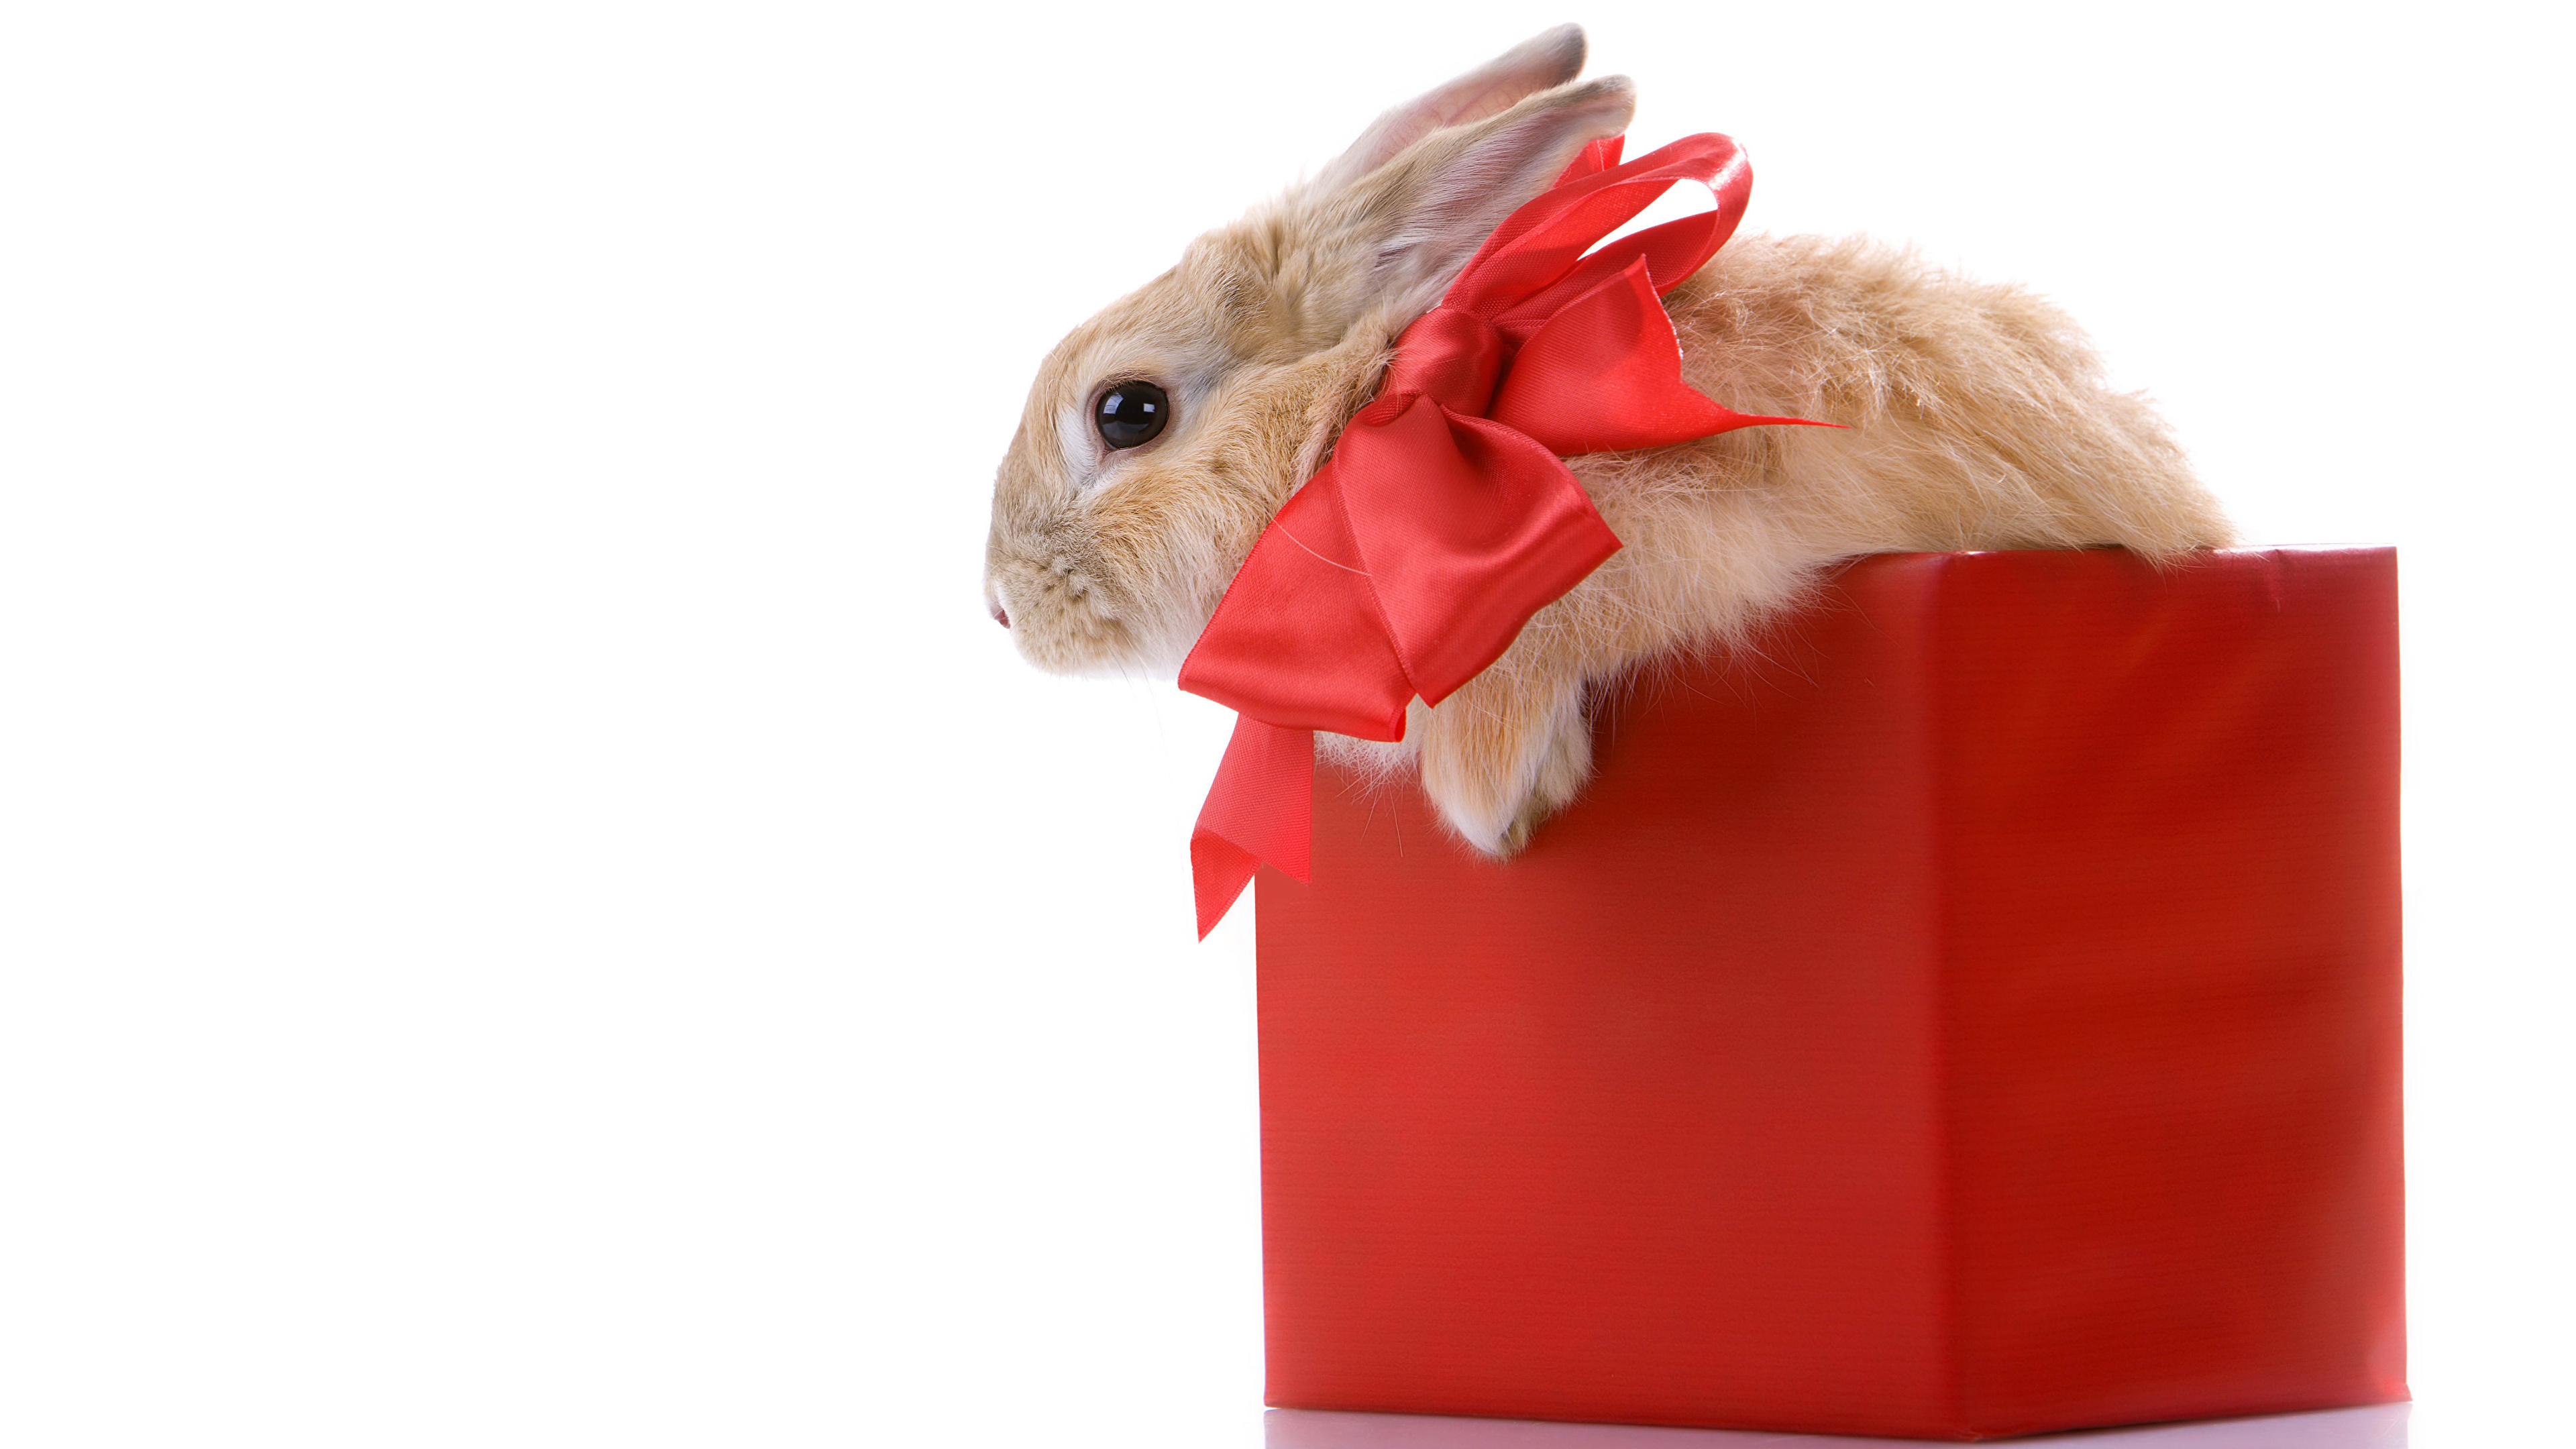 Картинки Кролики Коробка Бантик животное белом фоне 3840x2160 коробке коробки бант бантики Животные Белый фон белым фоном